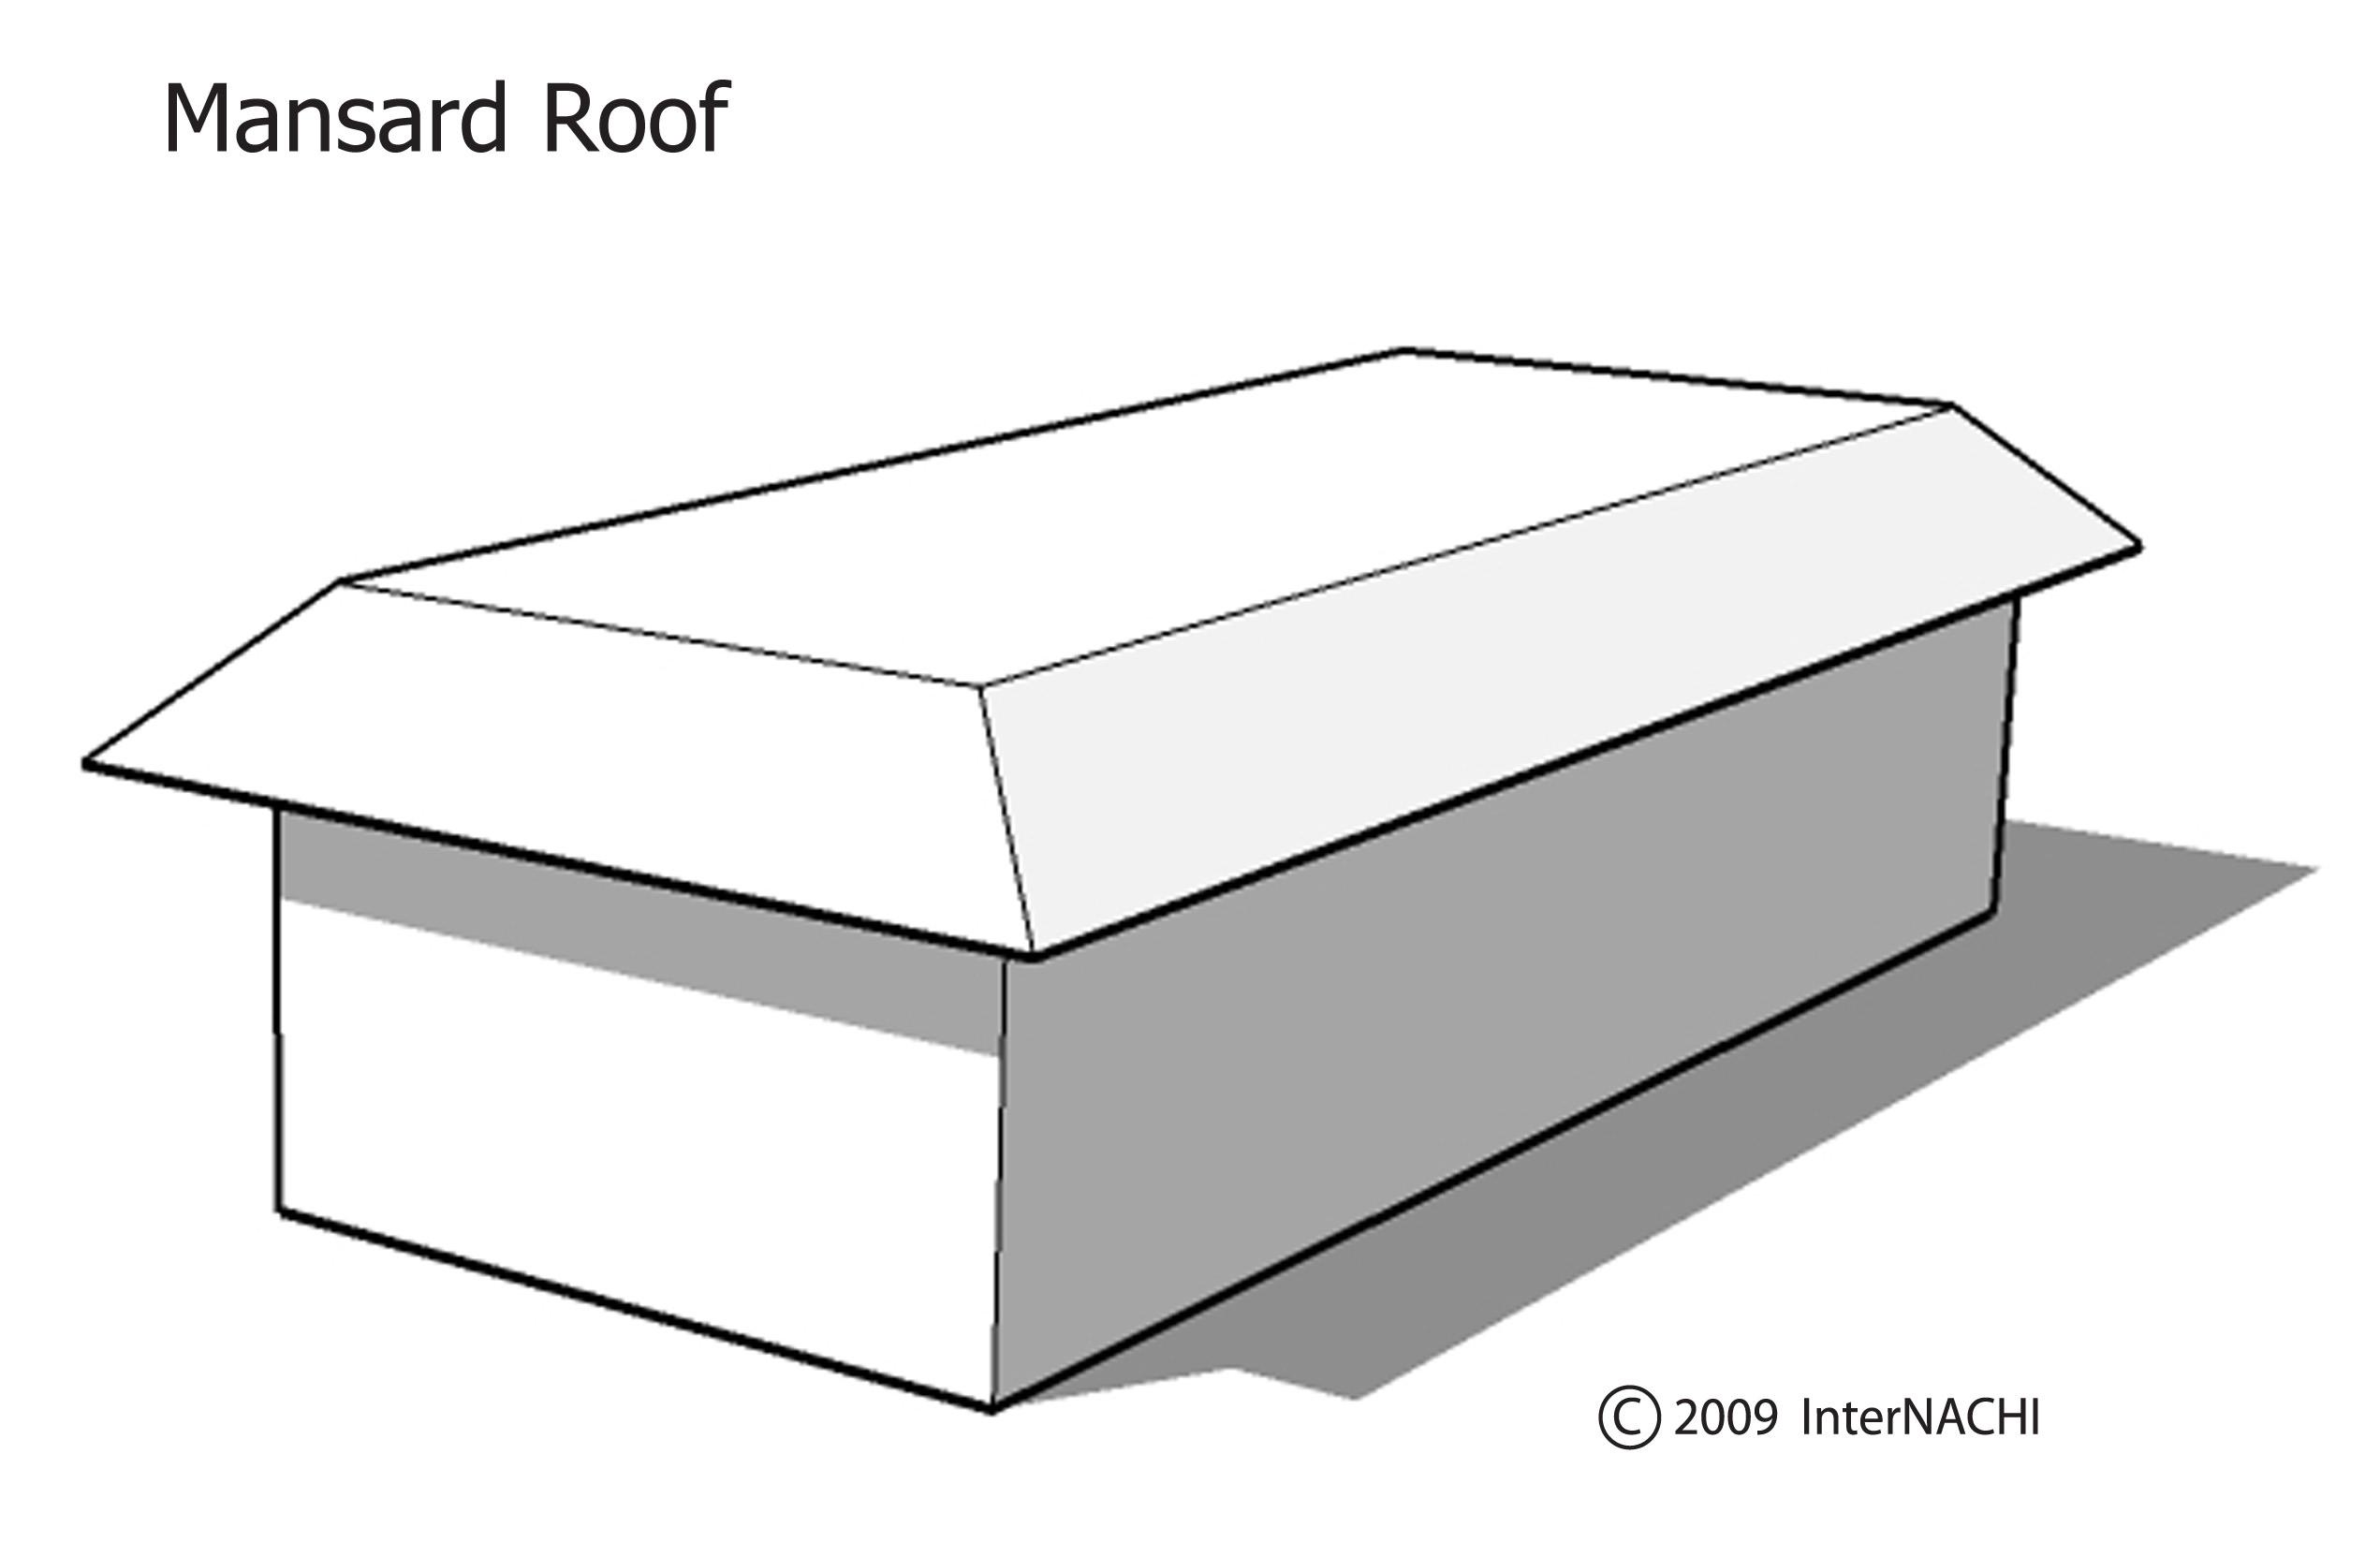 Mansard roof.